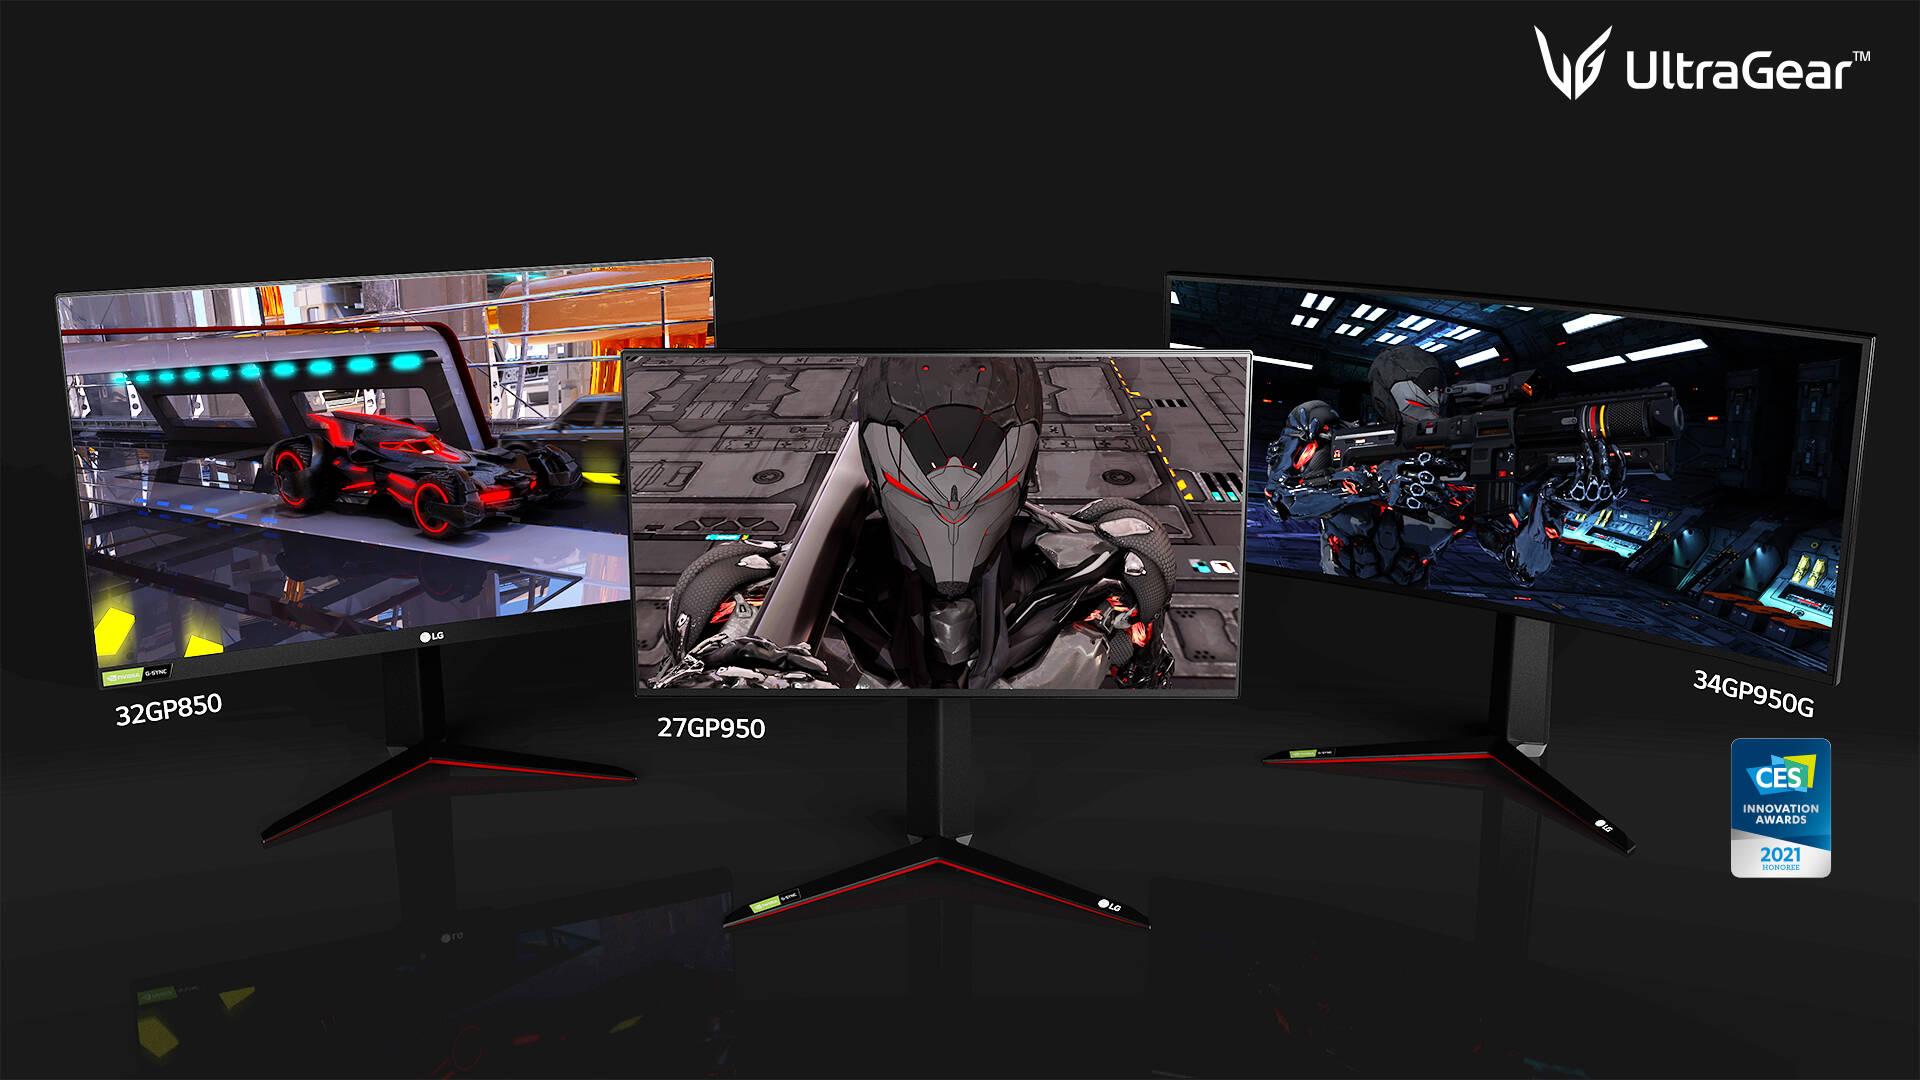 LG UltraGear CES 2021